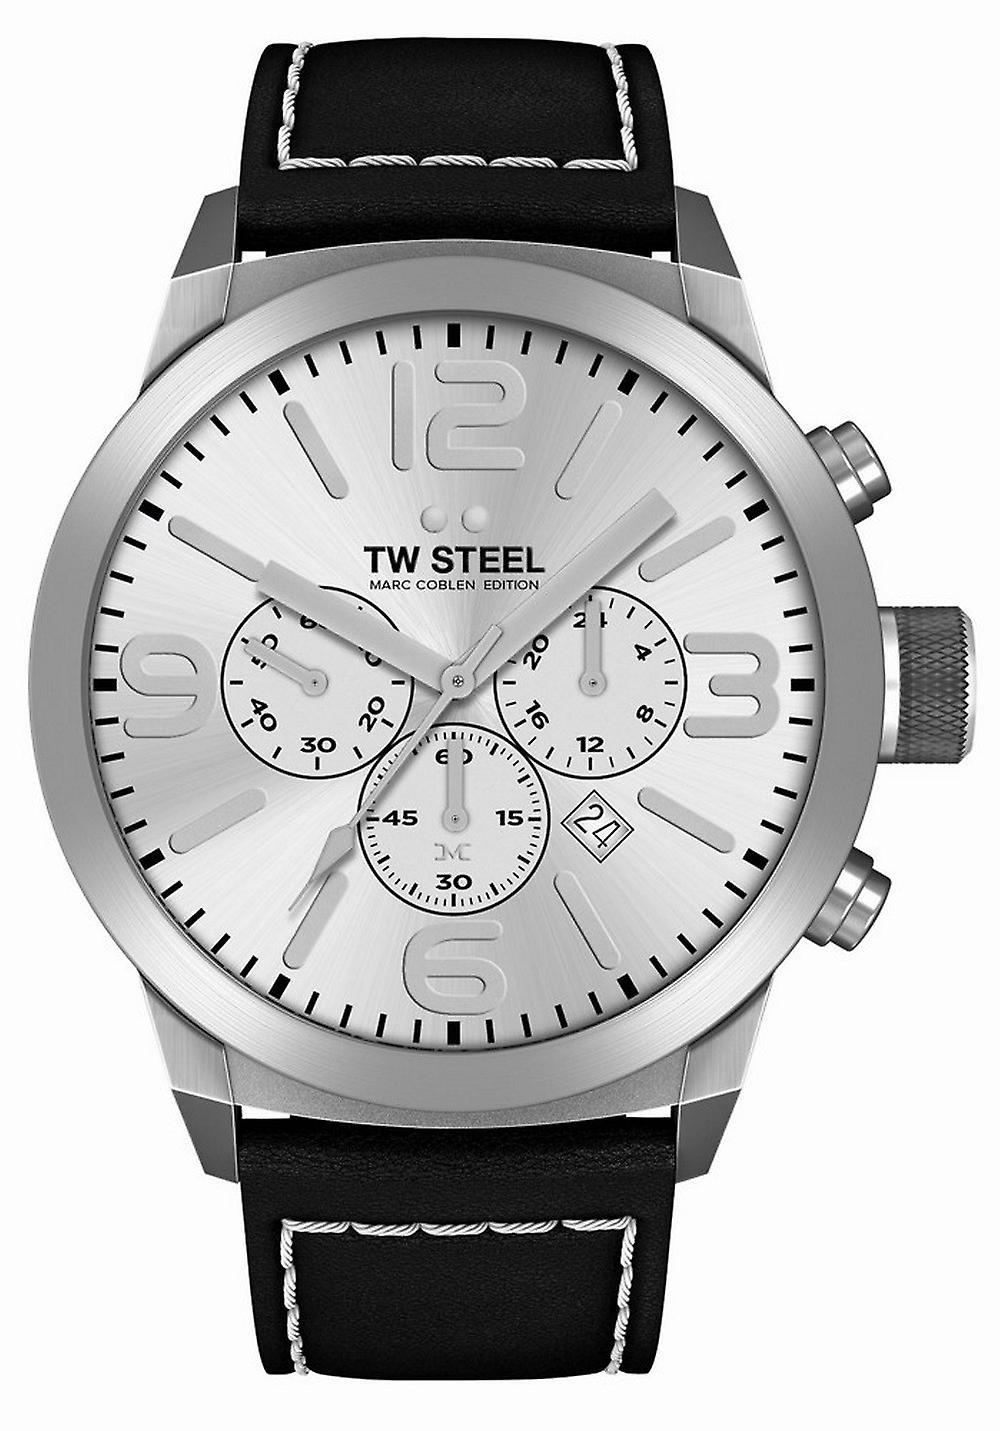 Tw Steel Twmc60 Mc Edition watch 50mm